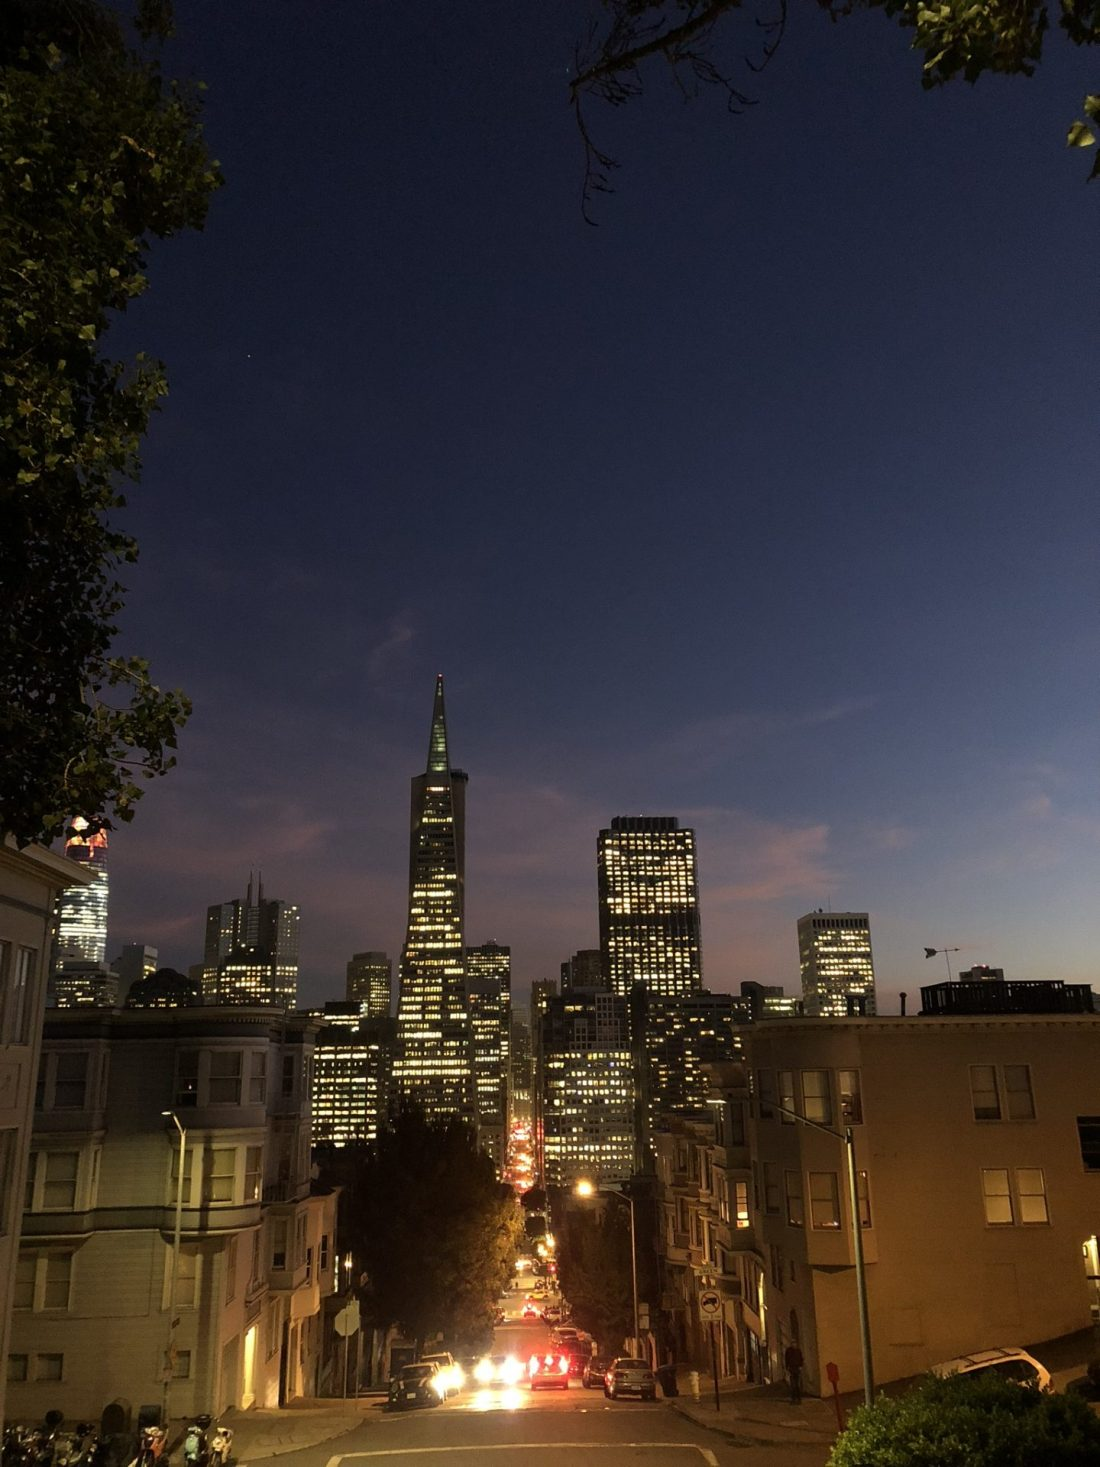 San Francisco skyline by night